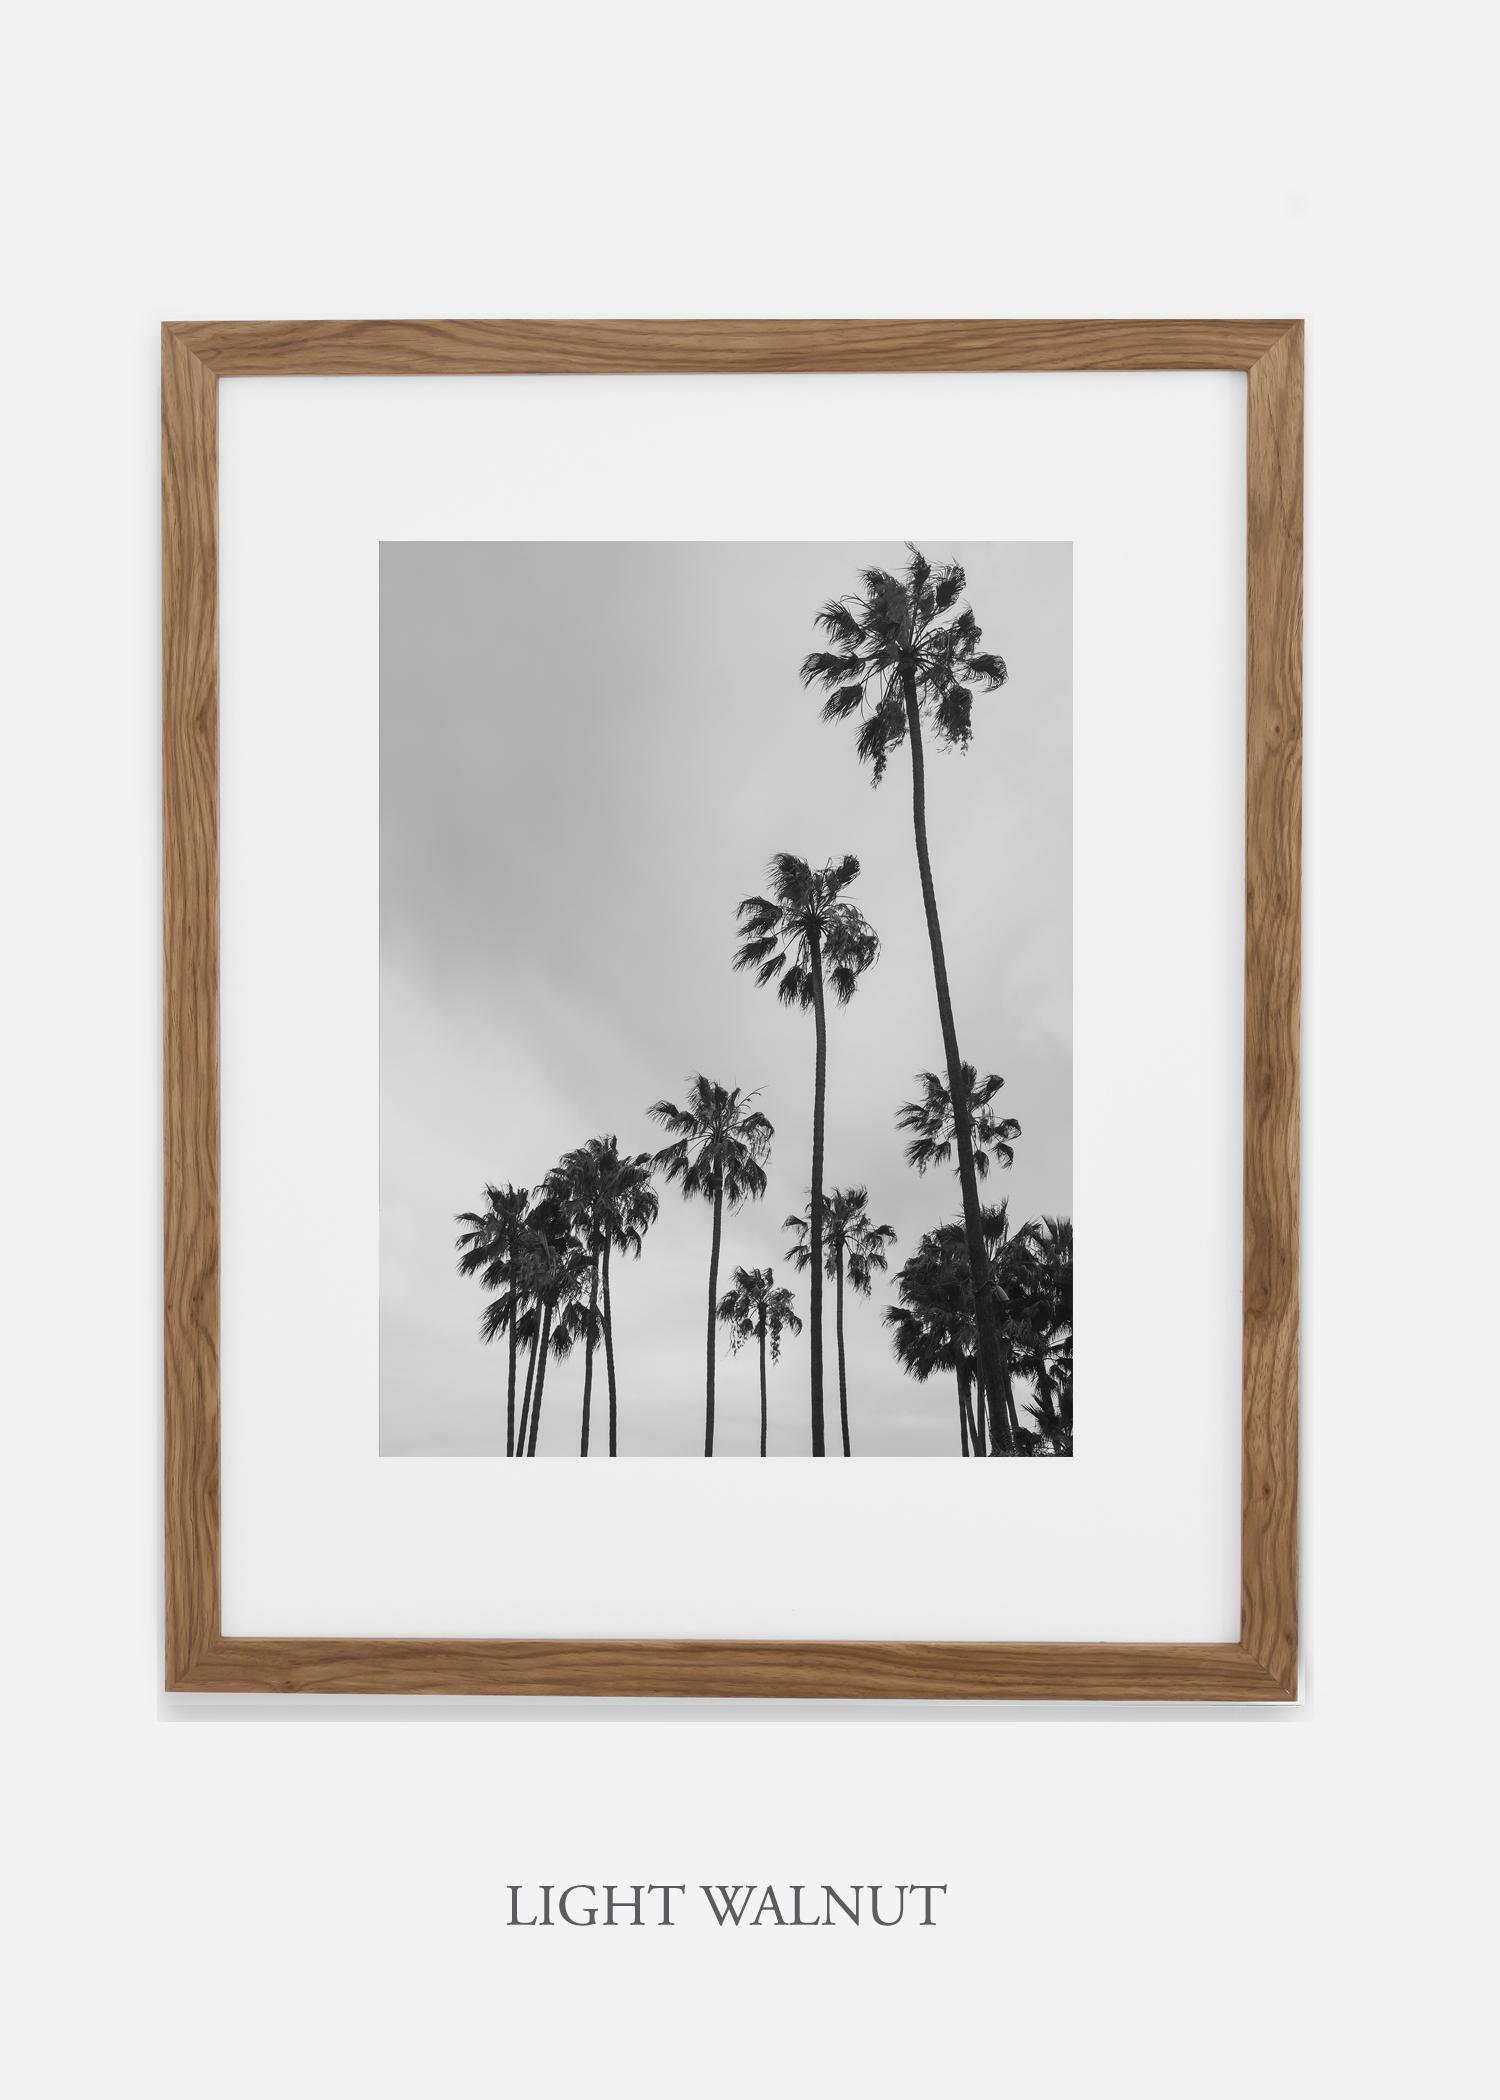 interiordesign_california_losangeles_palmtree_lightwalnutframe.jpg